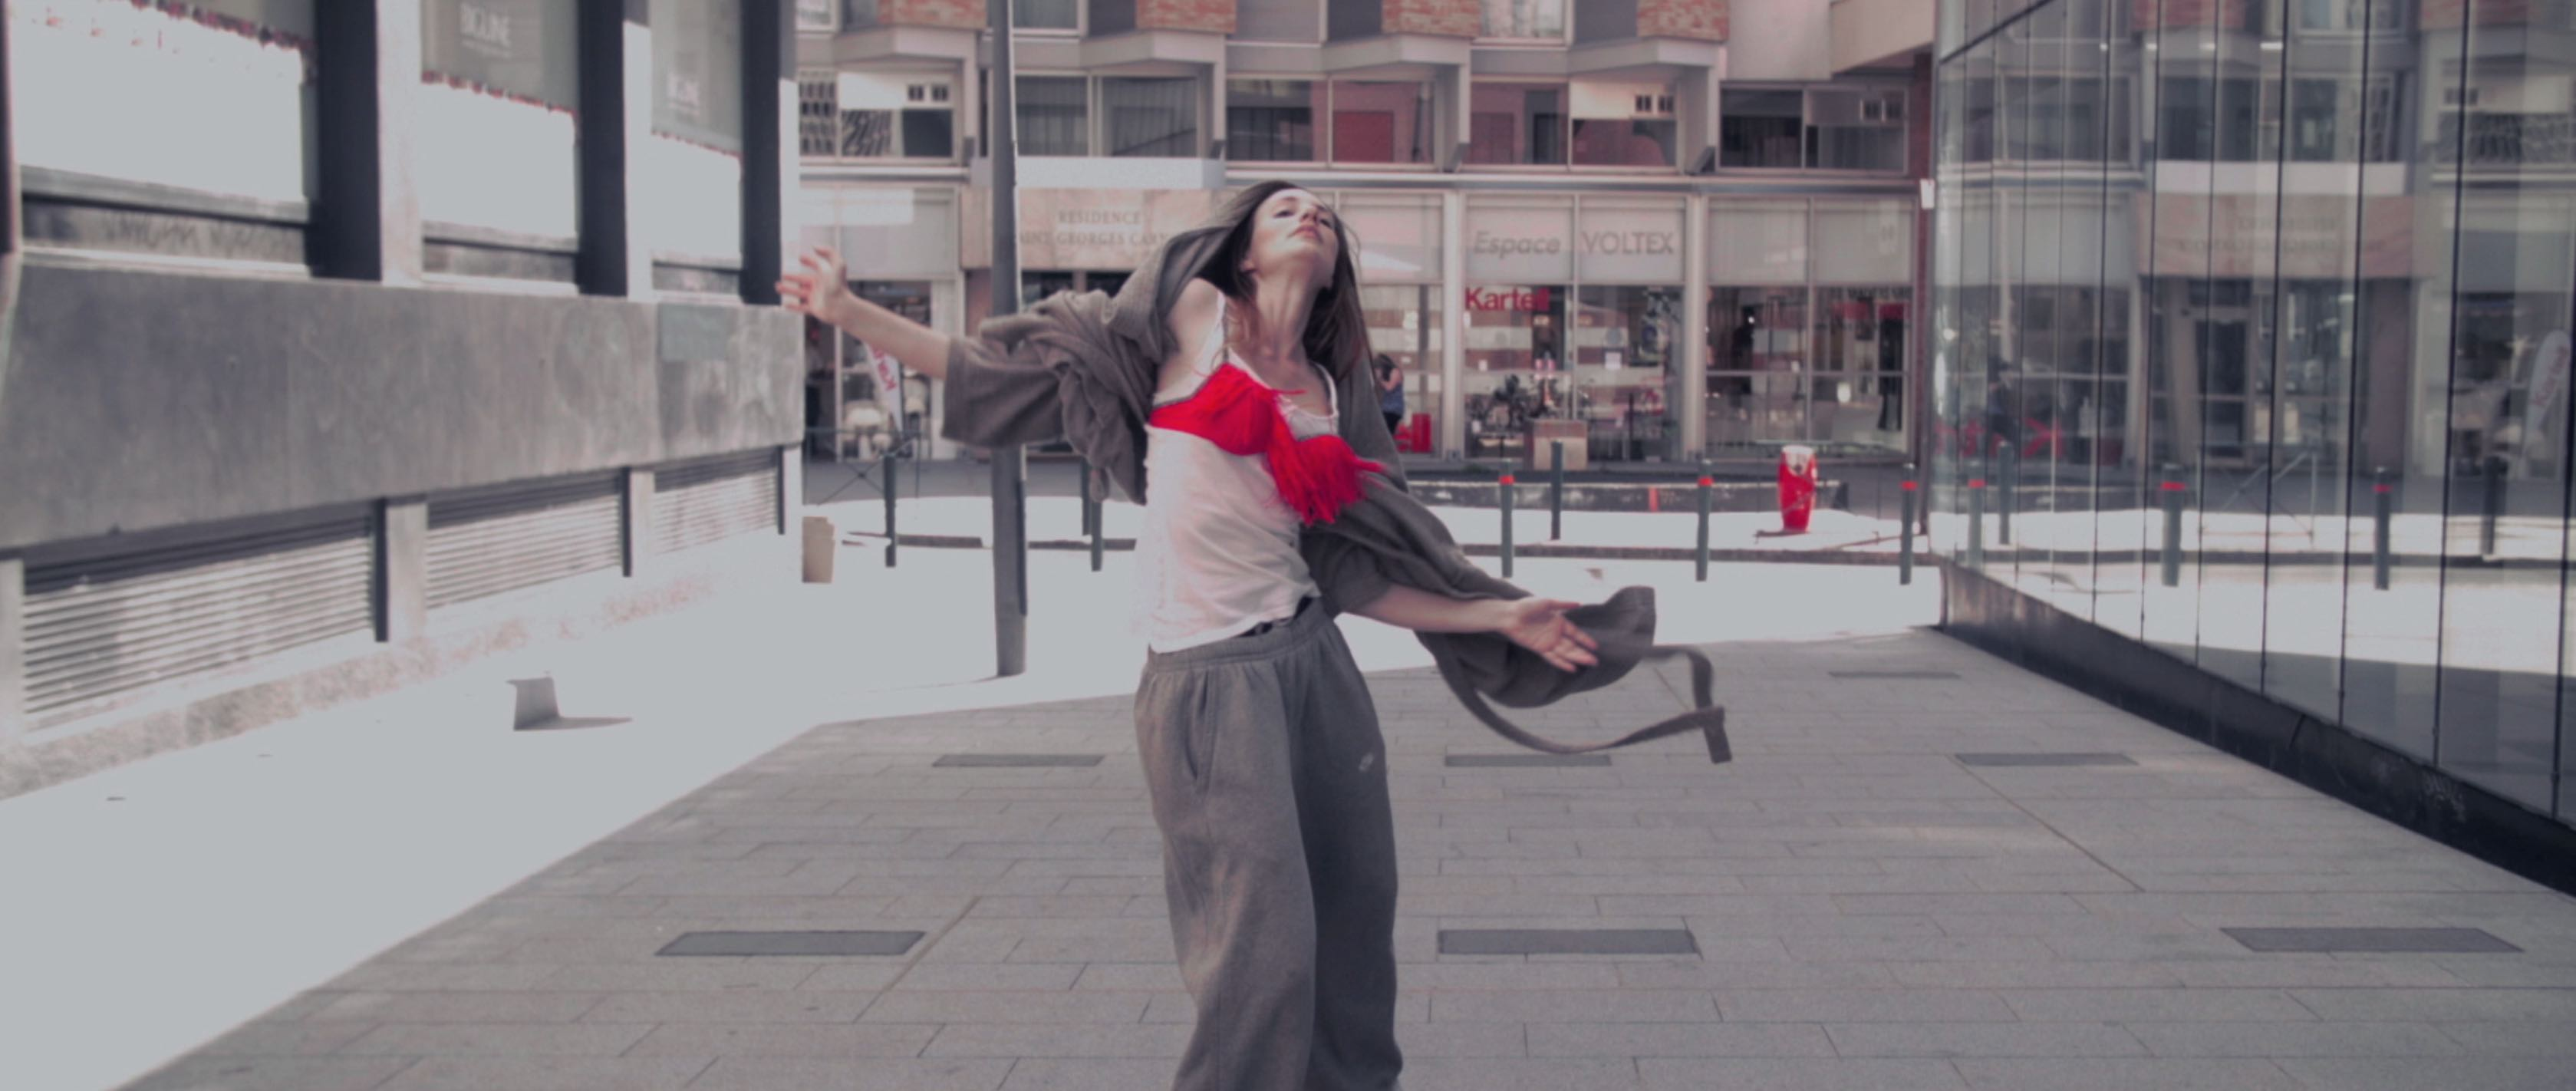 videoclip musique réalisatrice stephanie artaud